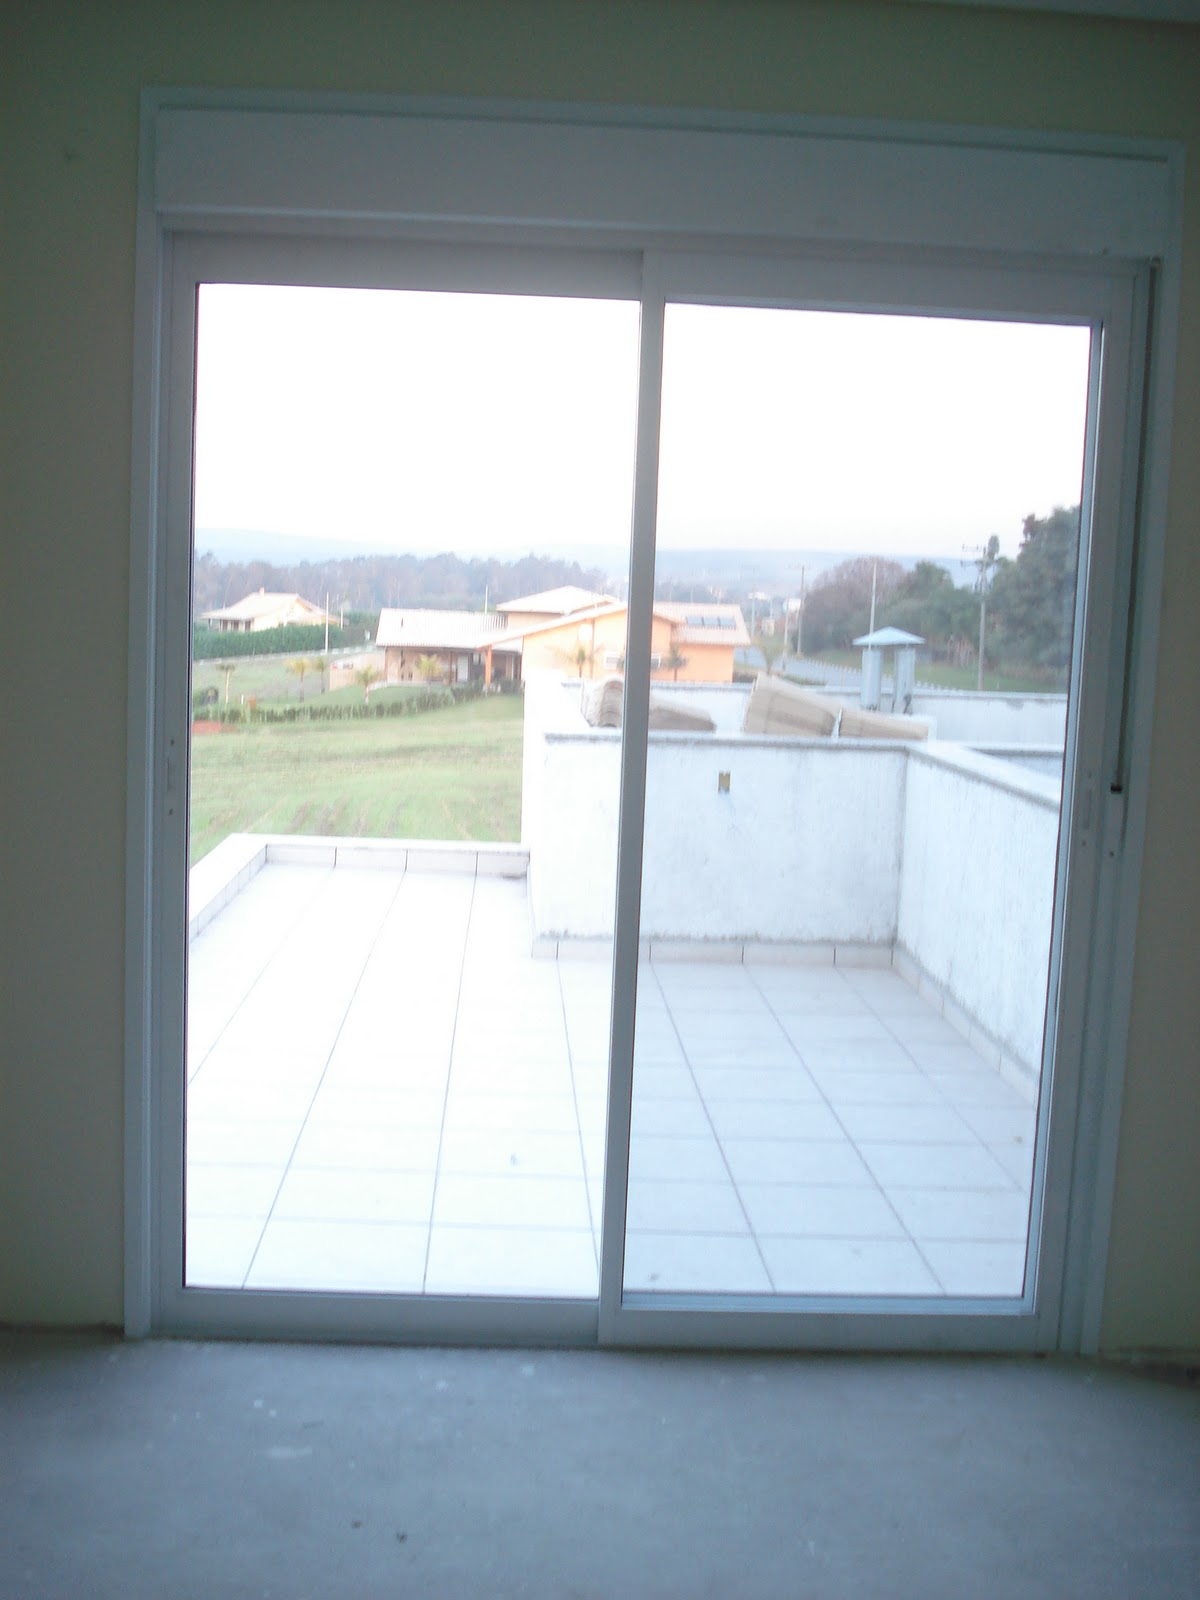 #446D87 Vista Interna da Porta acima só que com a persiana fechada. 4386 Janela Aluminio Integrada